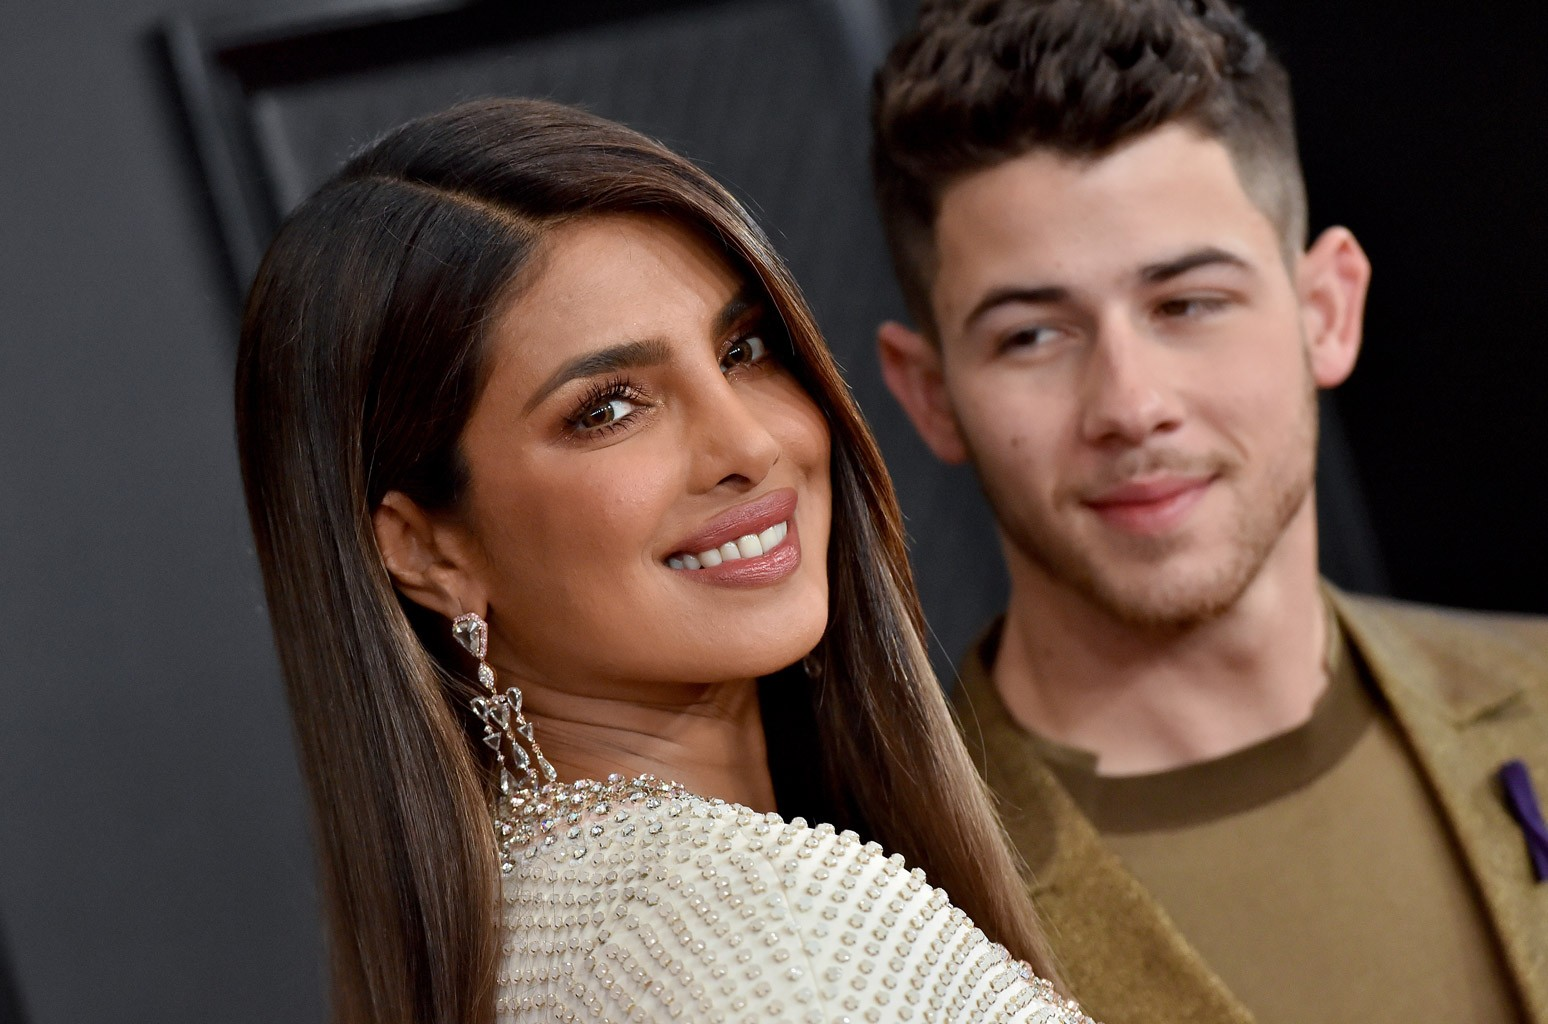 Priyanka Chopra Jonas Nick Jonas Grammys 2020 Billboard 1548 1605556358 compressed